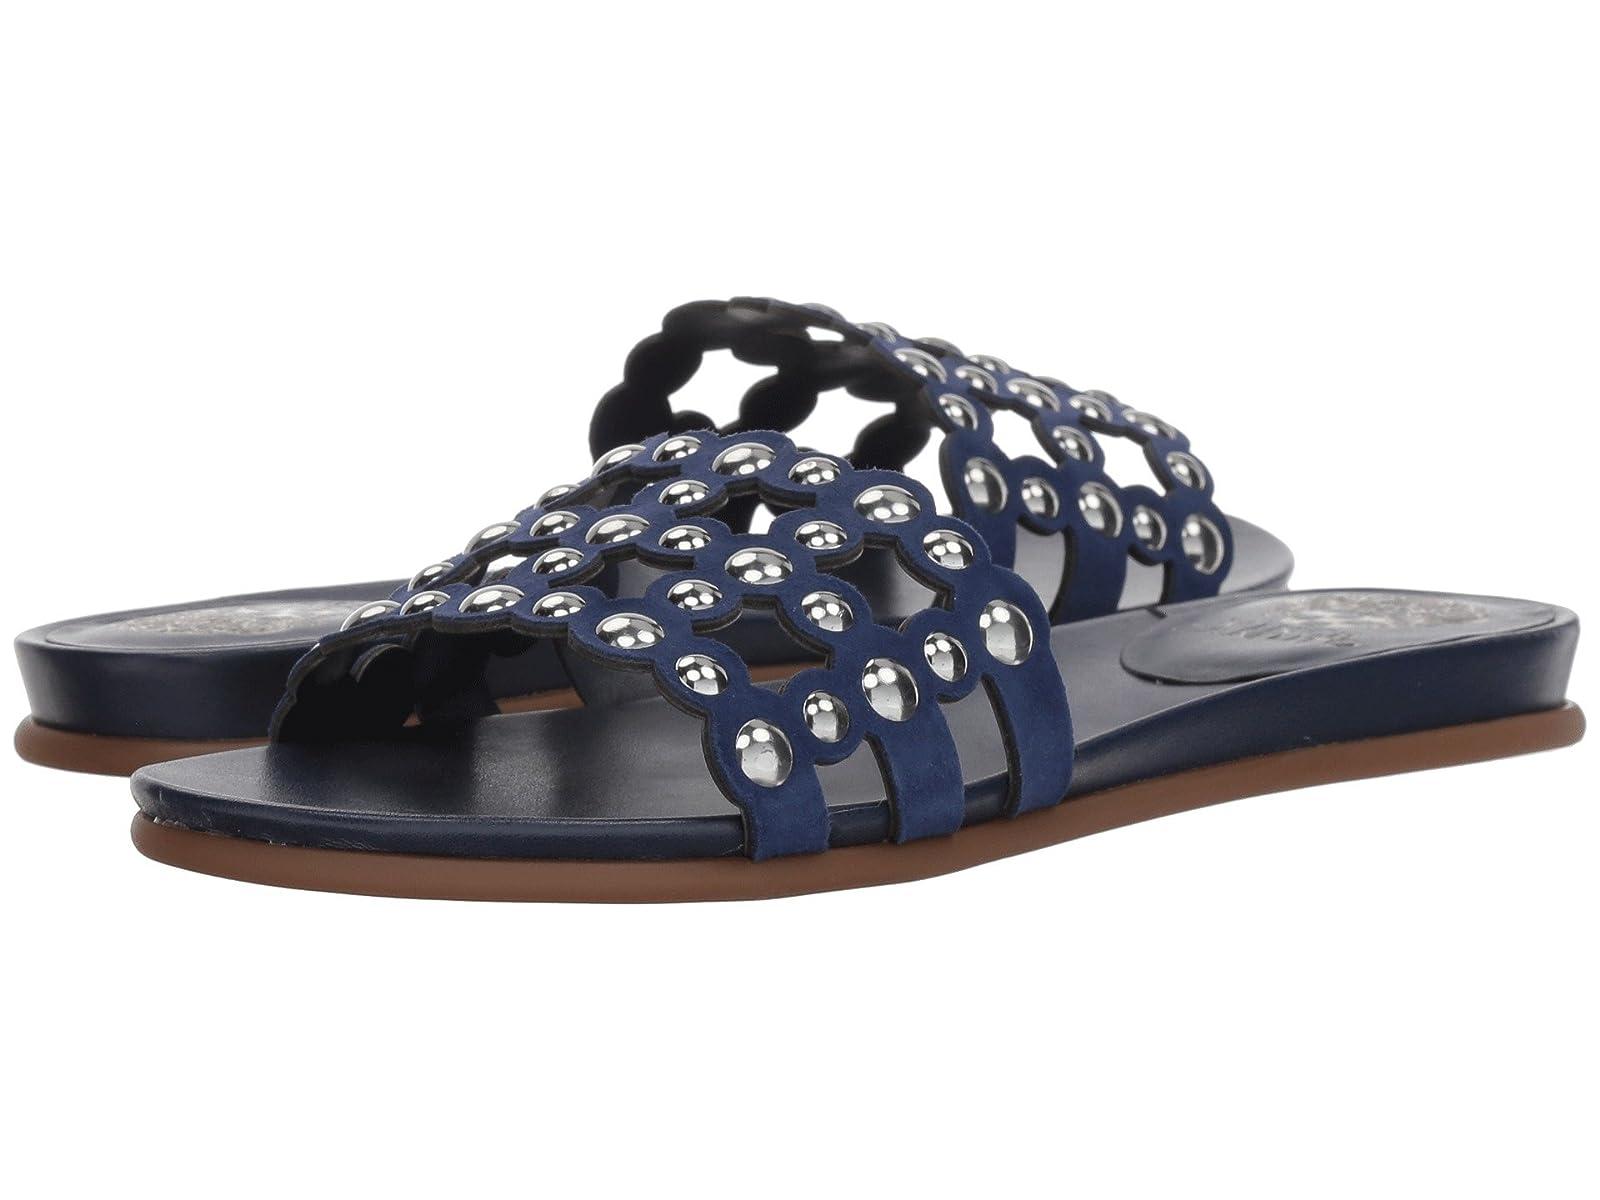 Vince Camuto EllannaCheap and distinctive eye-catching shoes